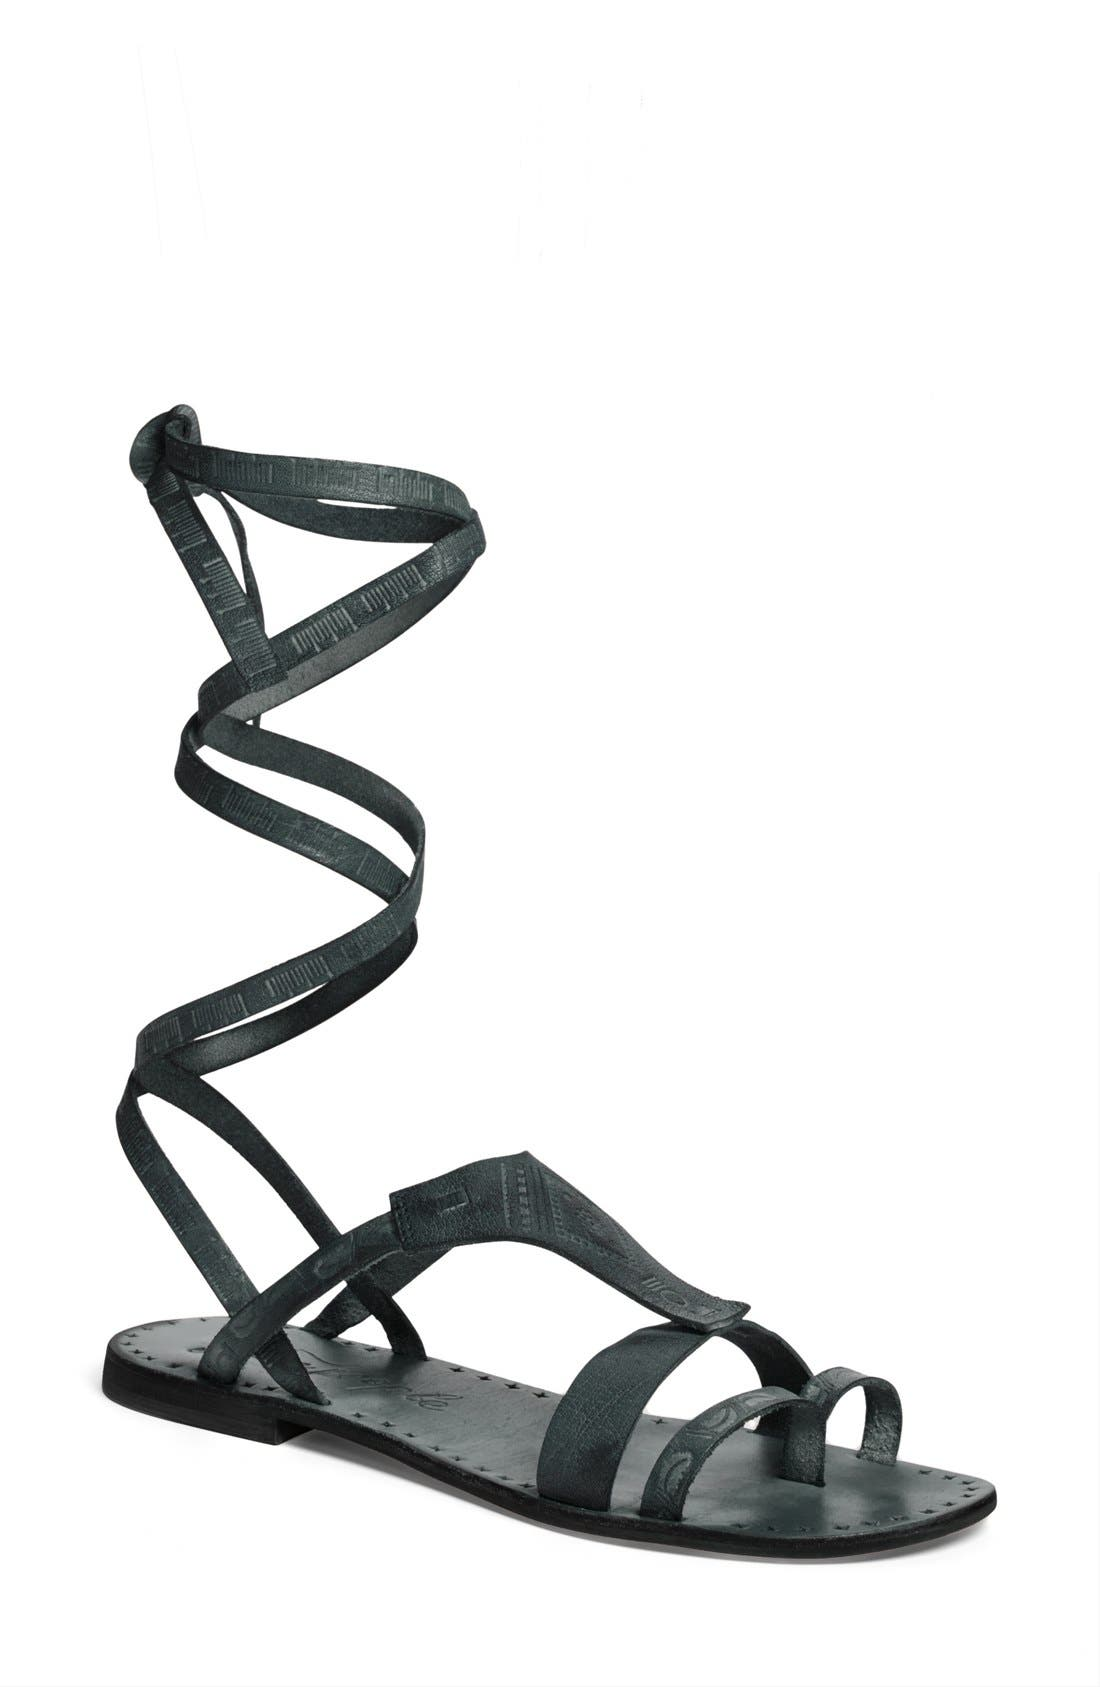 Main Image - Free People 'Oliviera' Gladiator Sandal (Women)